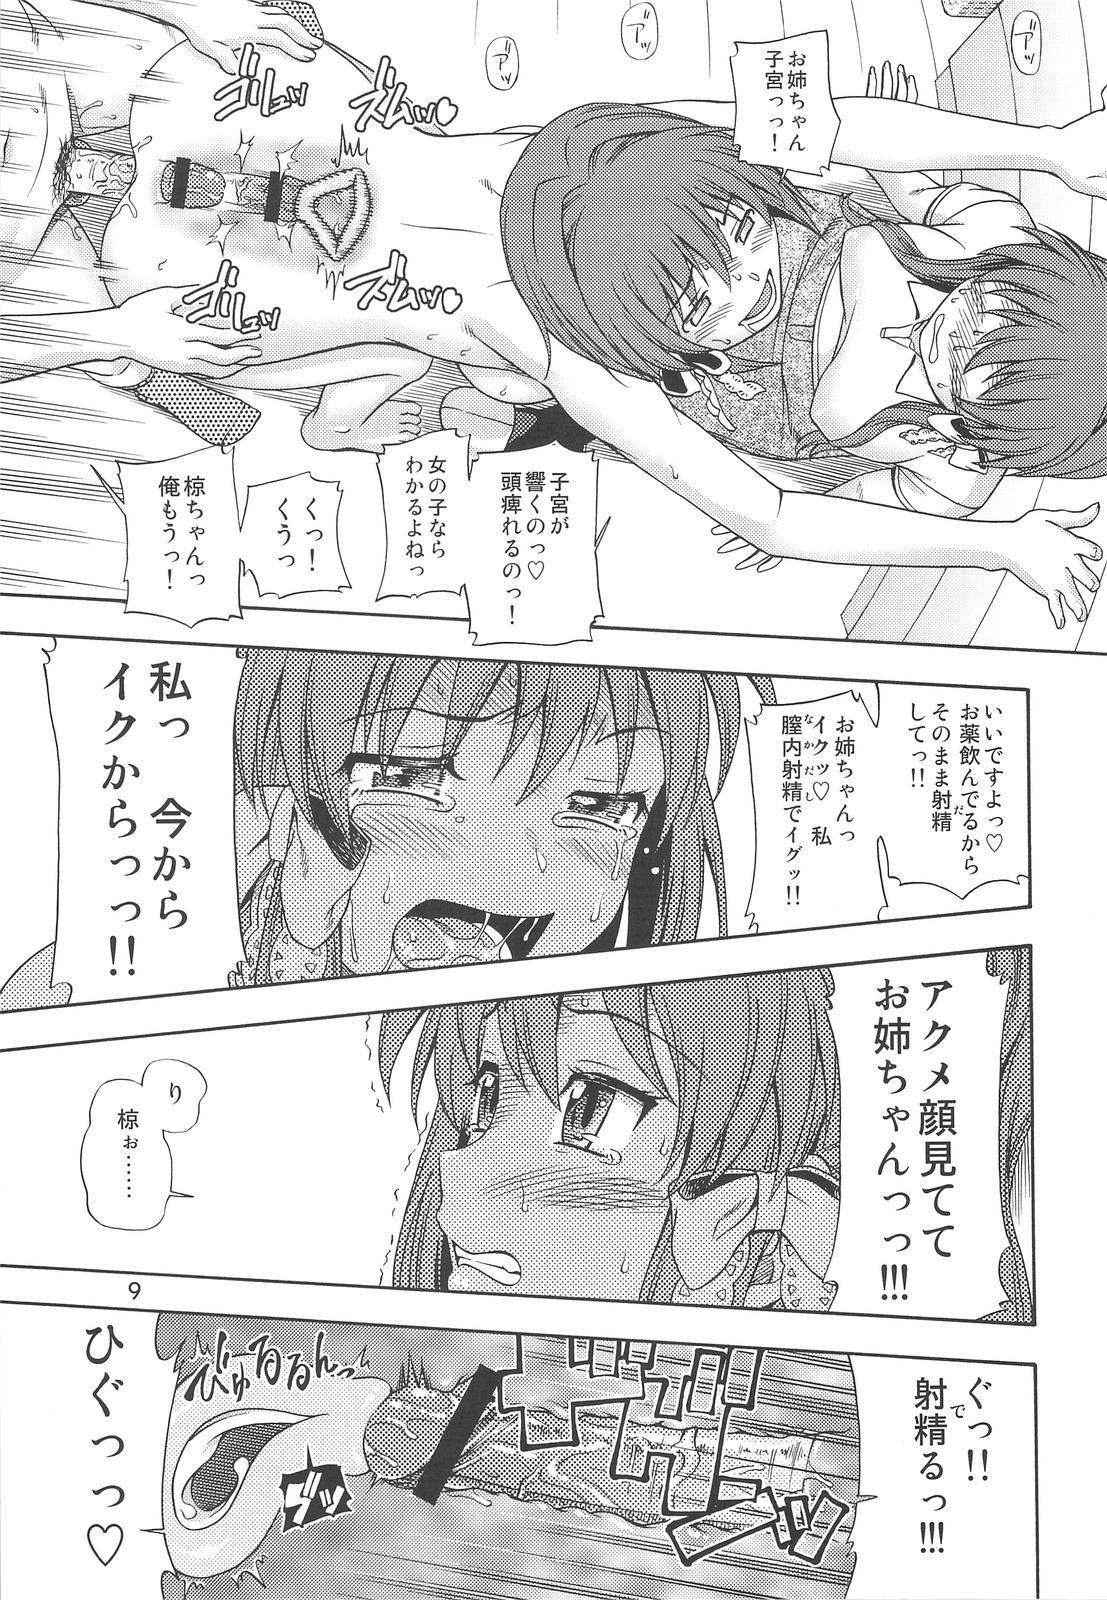 Fujibayashi Nado - Fujibayashi Twins After Story 7